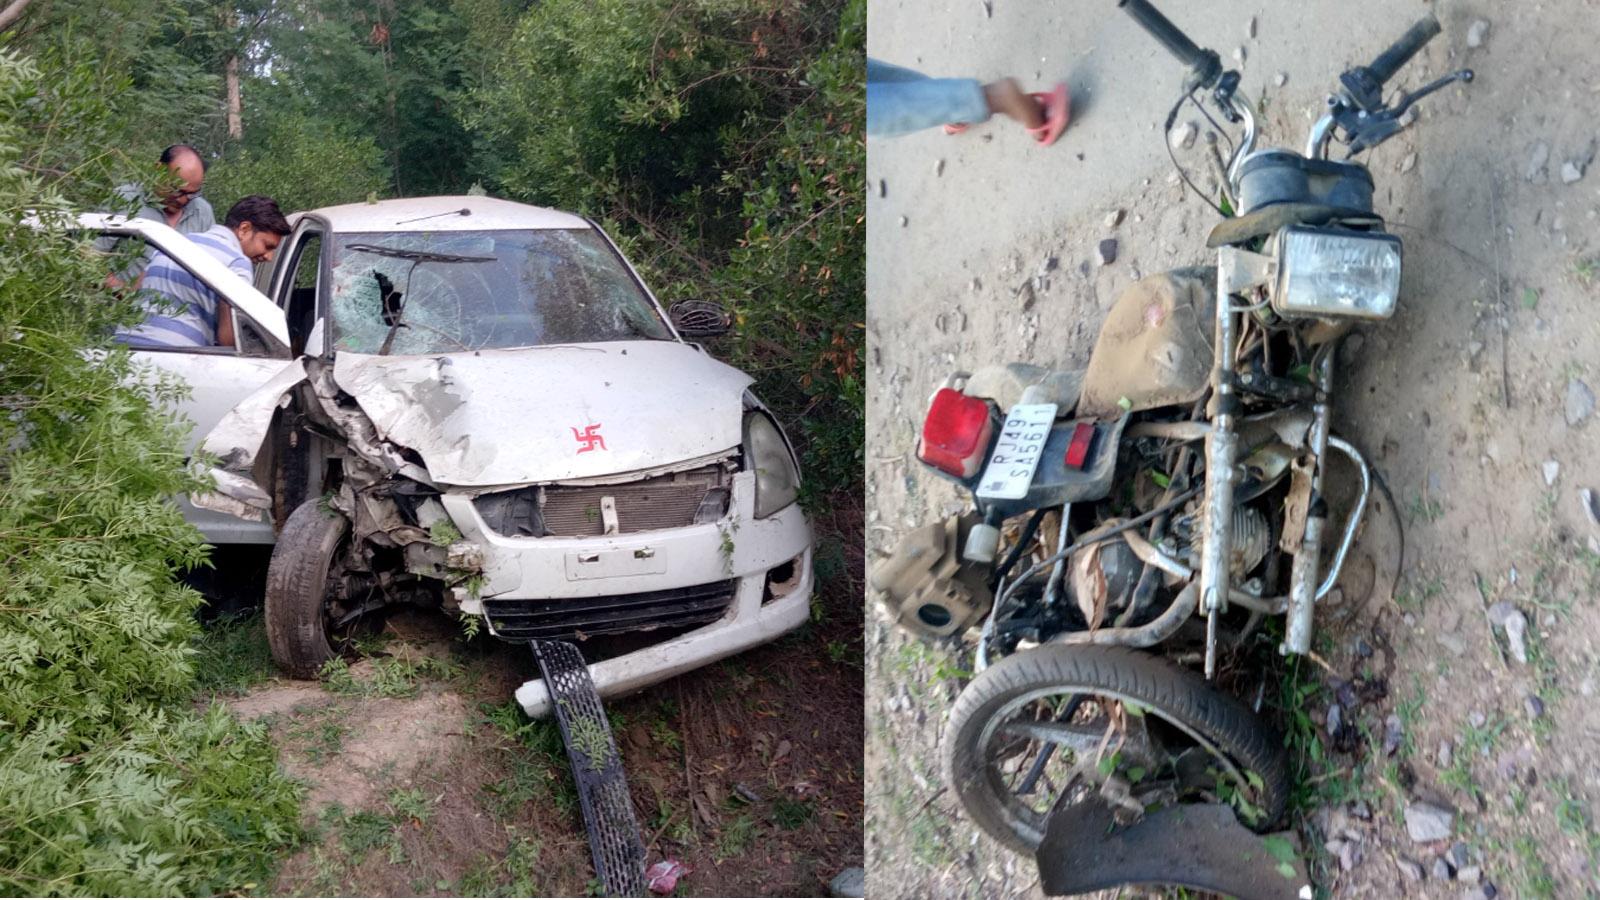 Accident, Bike, Car, Collision, Rajasthan